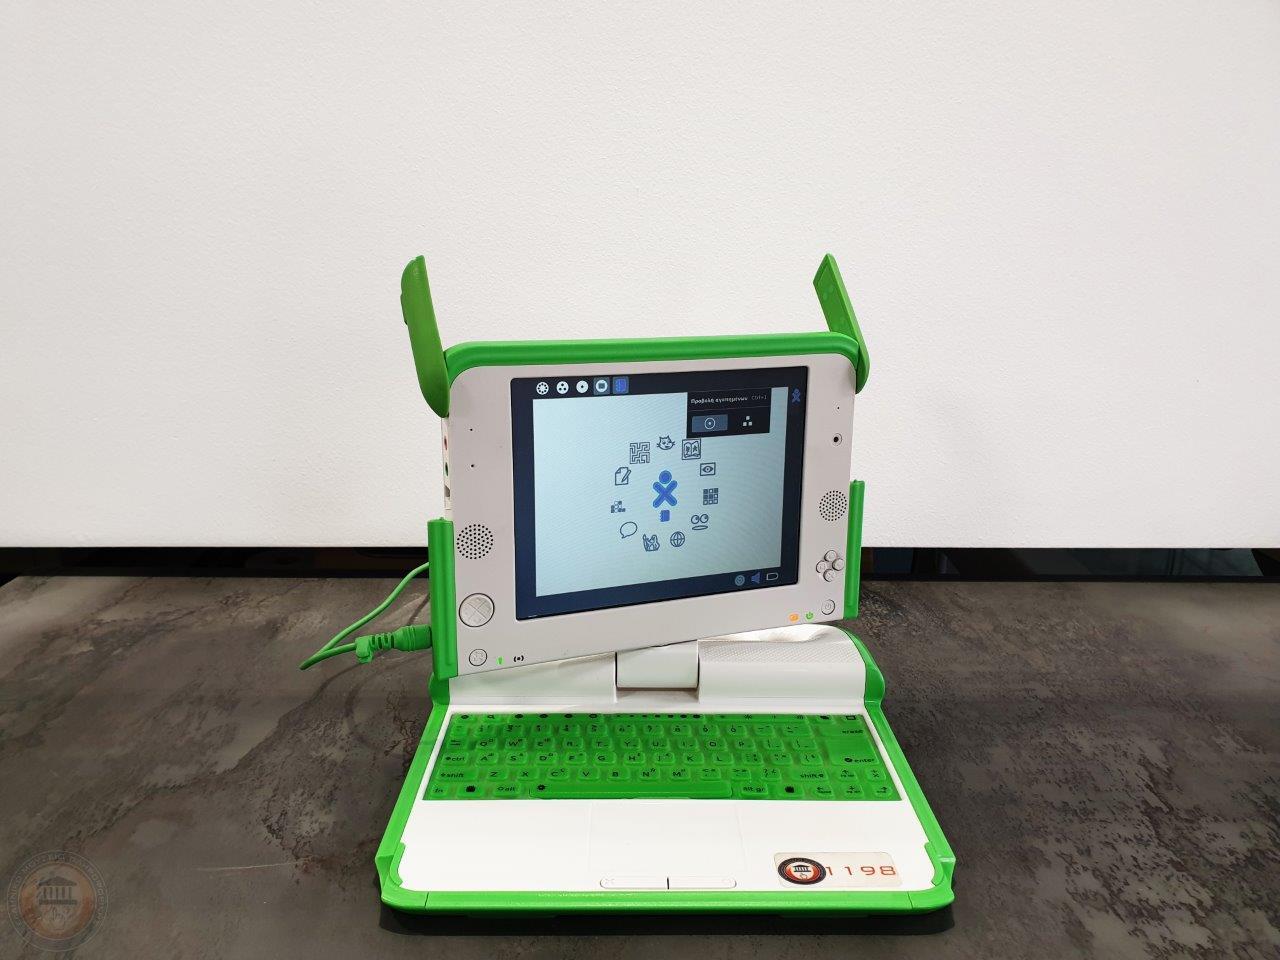 OLPC_watermark